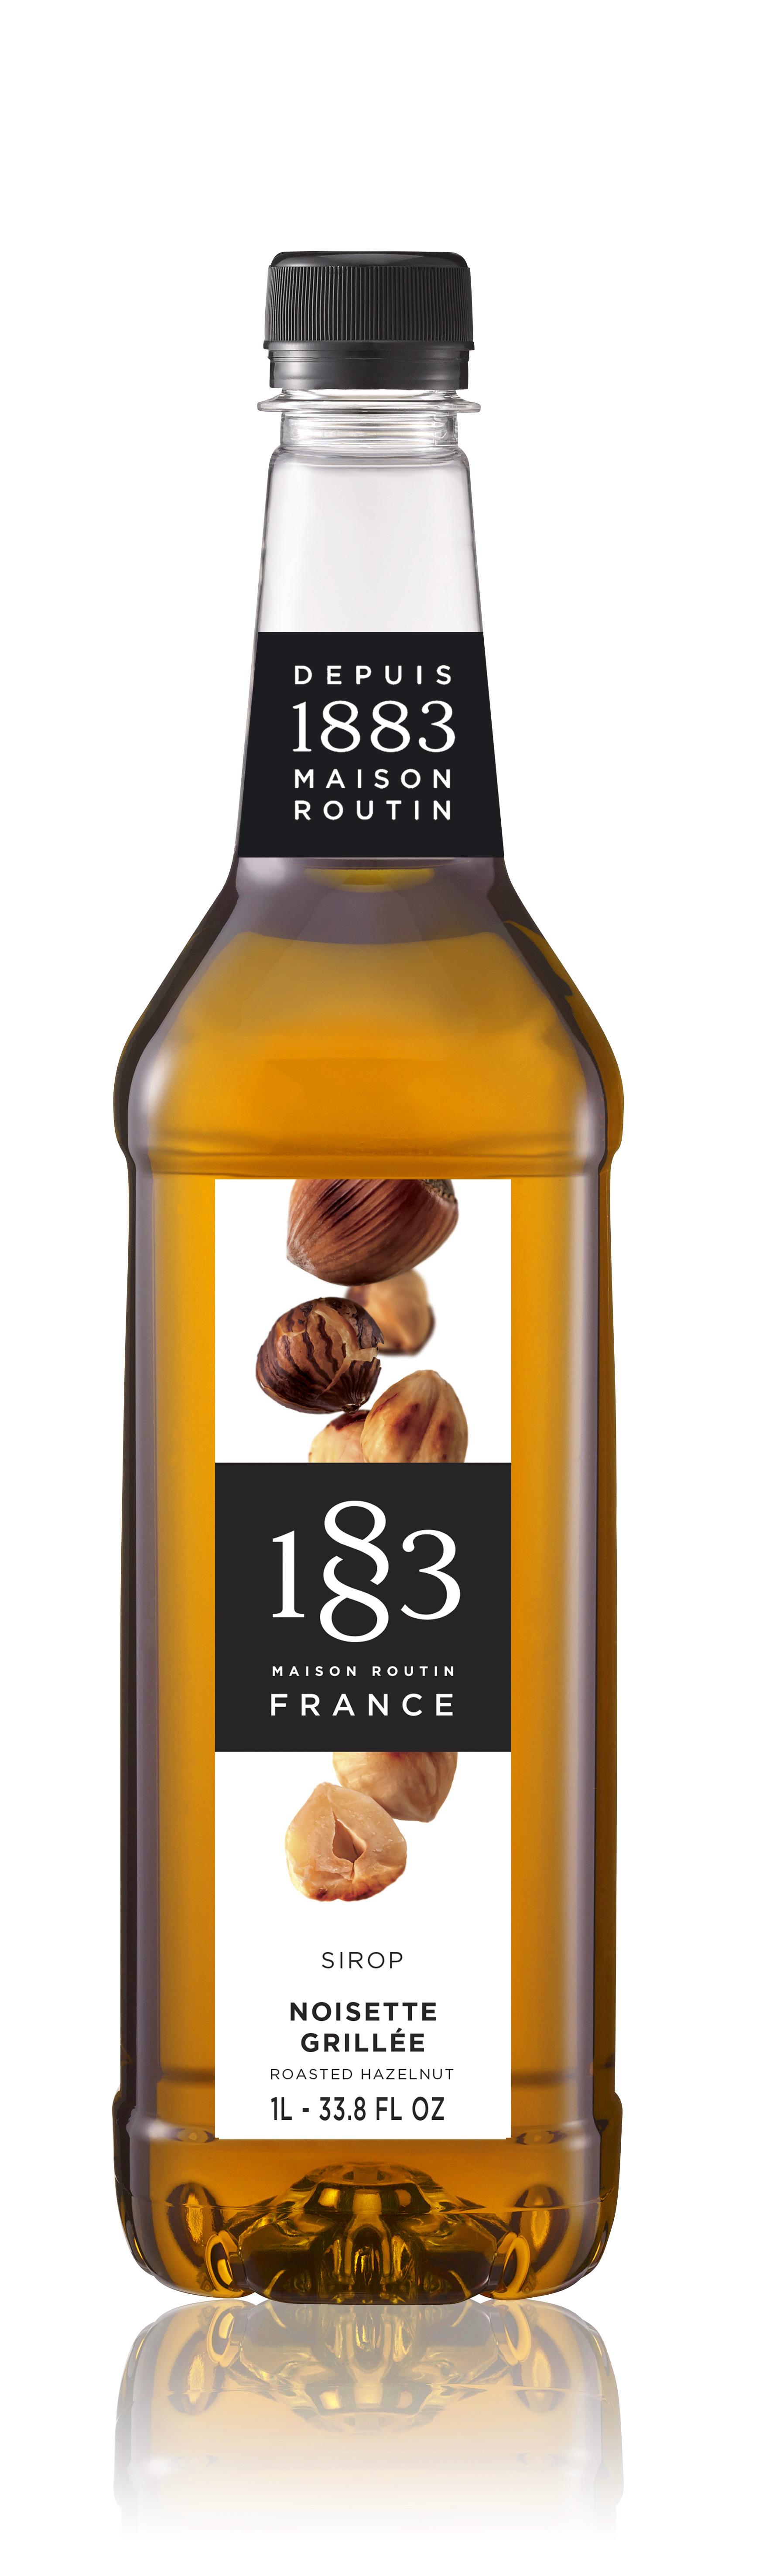 1883 Syrup Roasted Hazelnut 1L PET Plastic Bottle